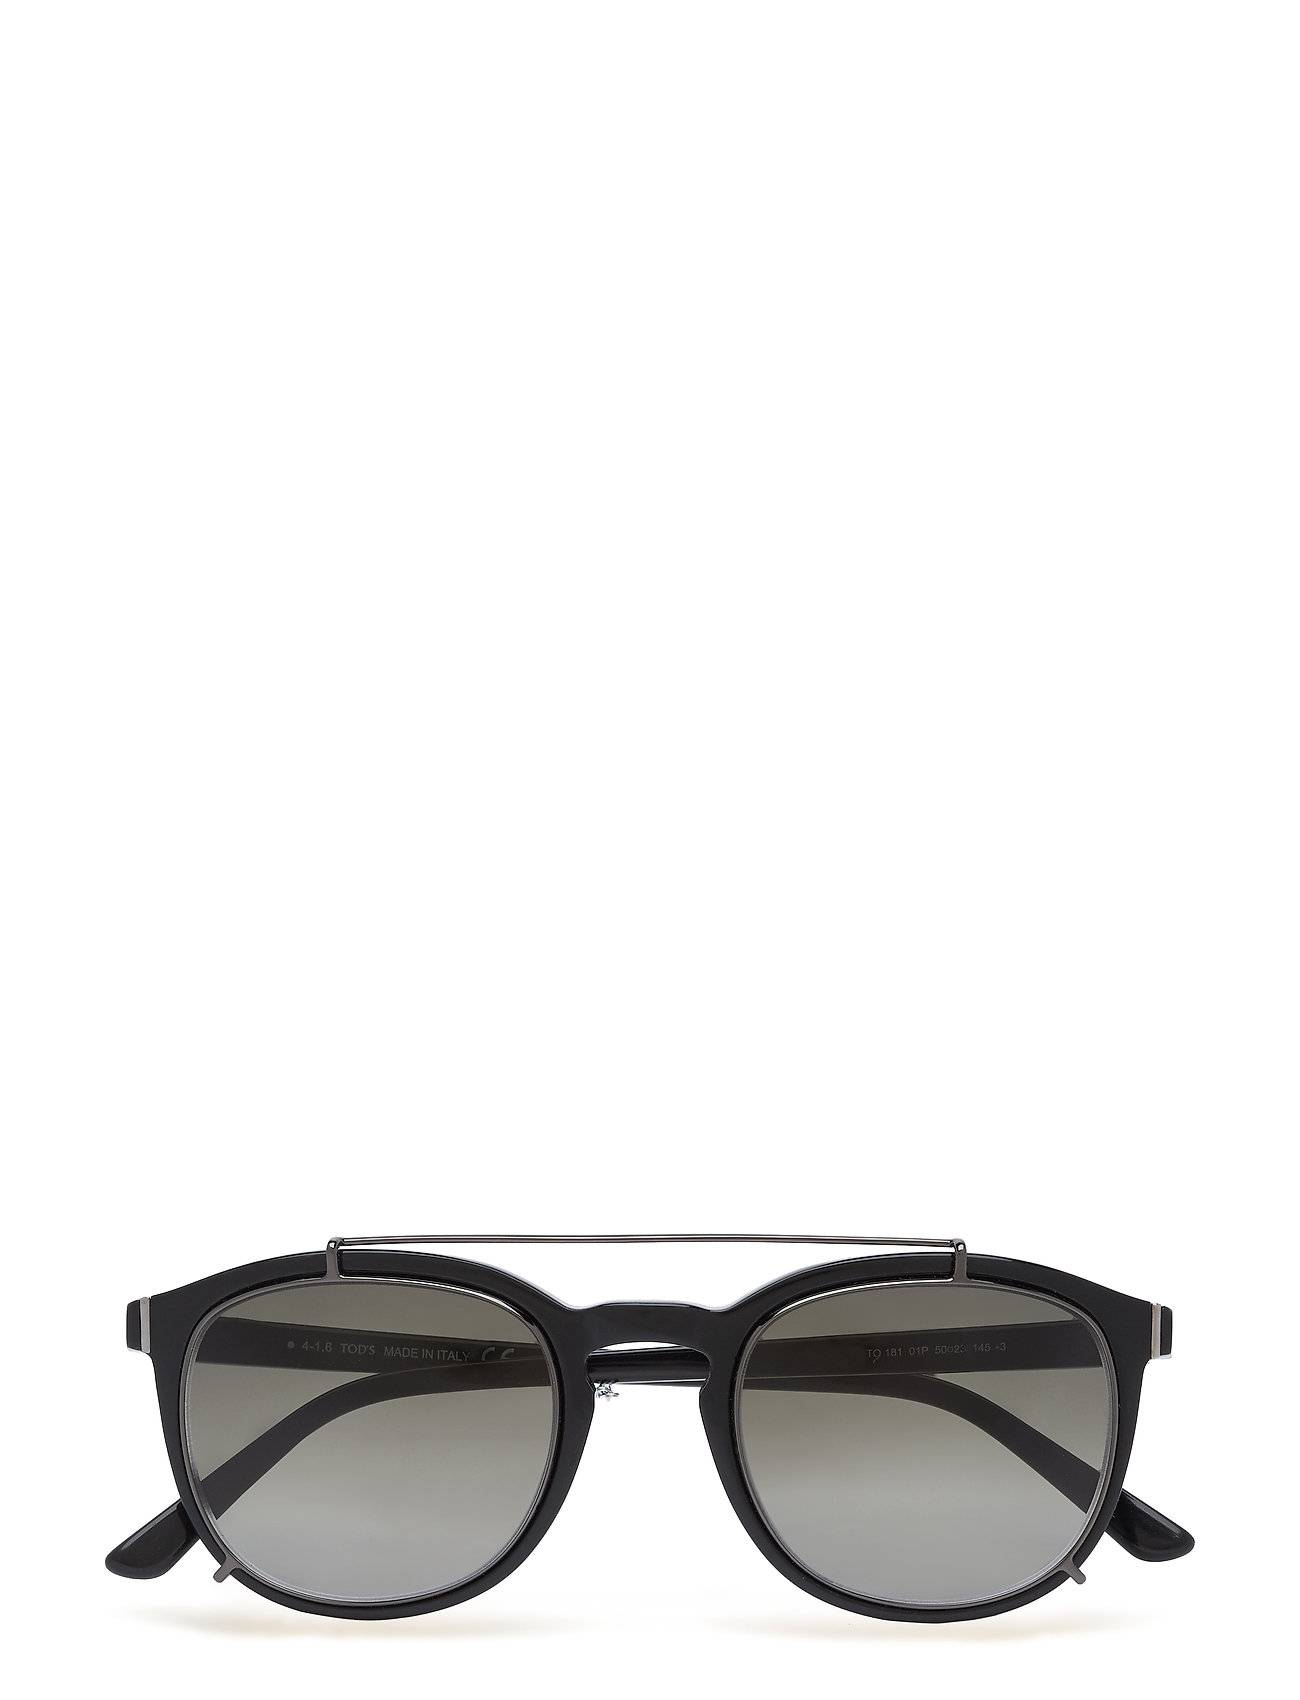 Image of TODS Sunglasses To0181 Wayfarer Aurinkolasit Musta TODS Sunglasses